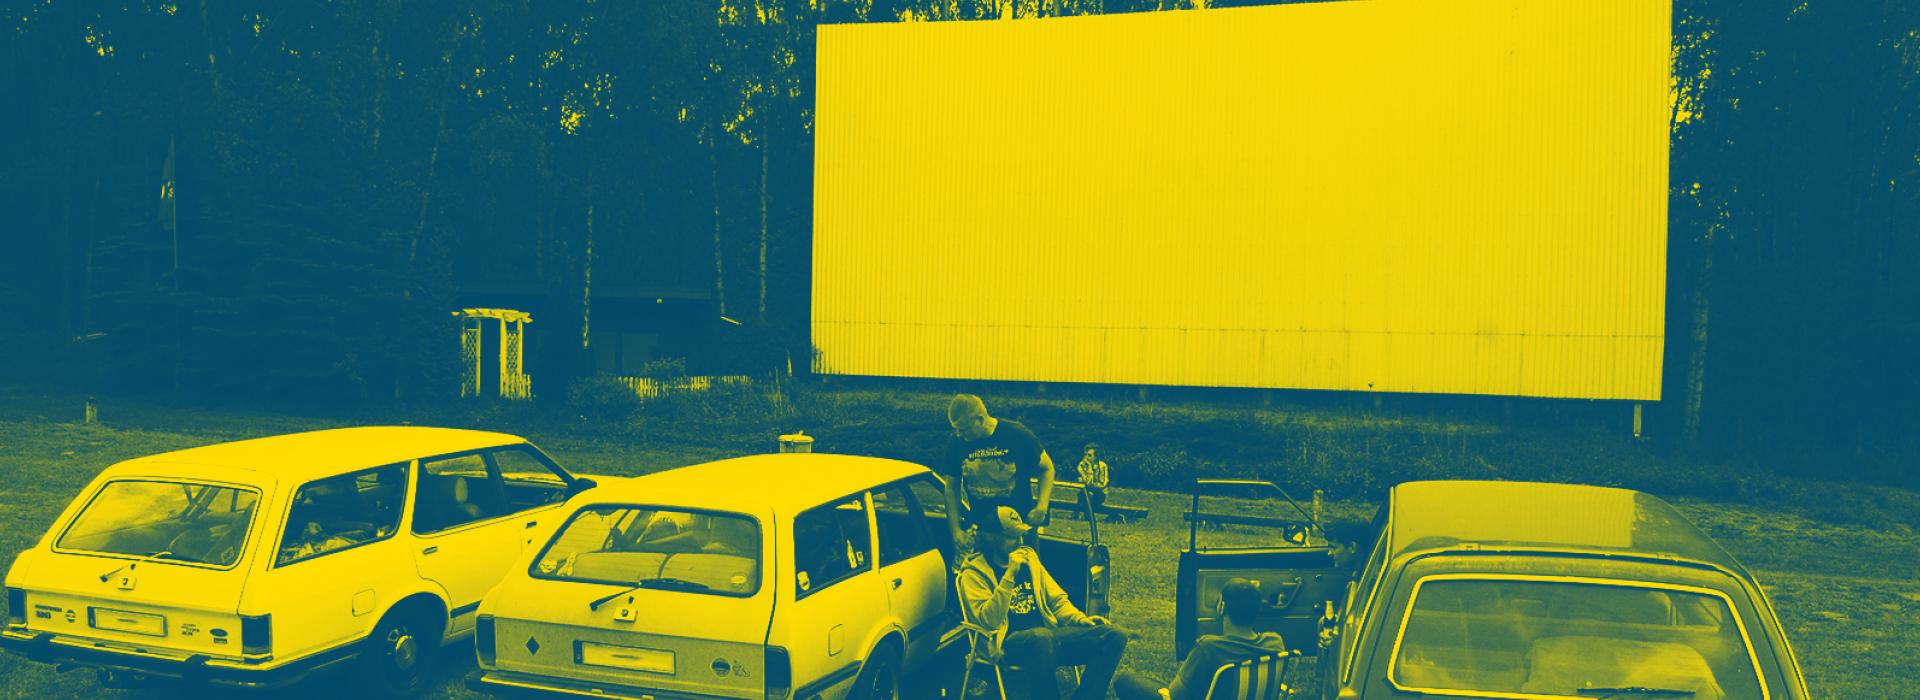 Auto Kino Kollektiv Zempow, Brandenburg, Wittstock Dosse, Leinwand